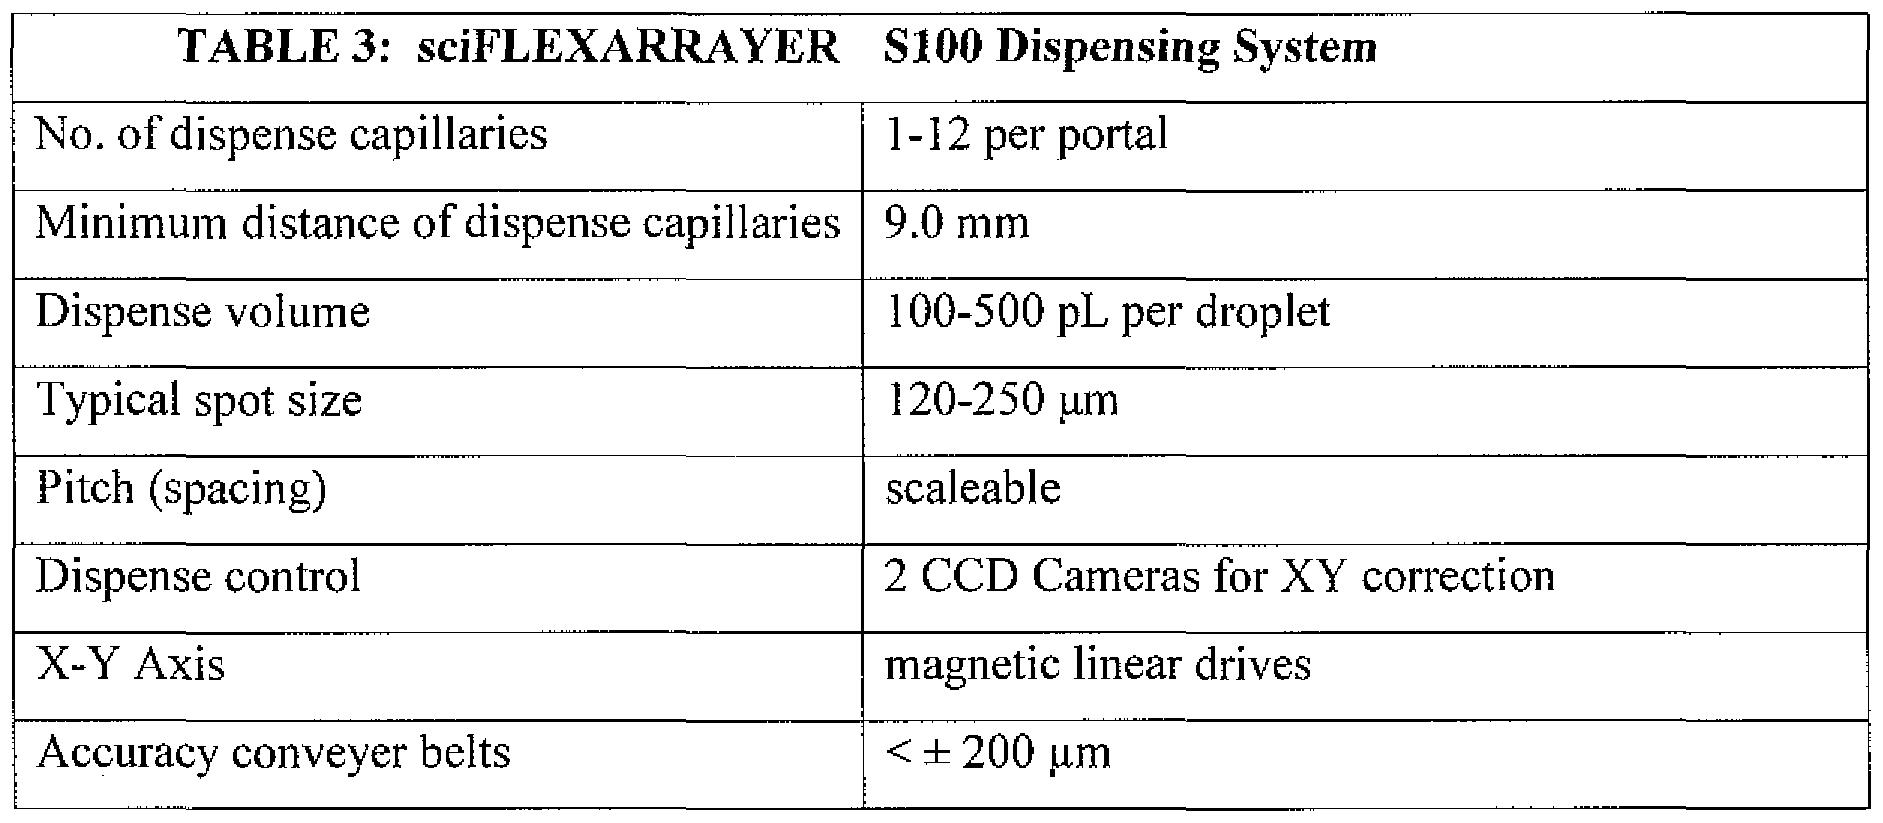 Miller Contact Tip Adapter #169728